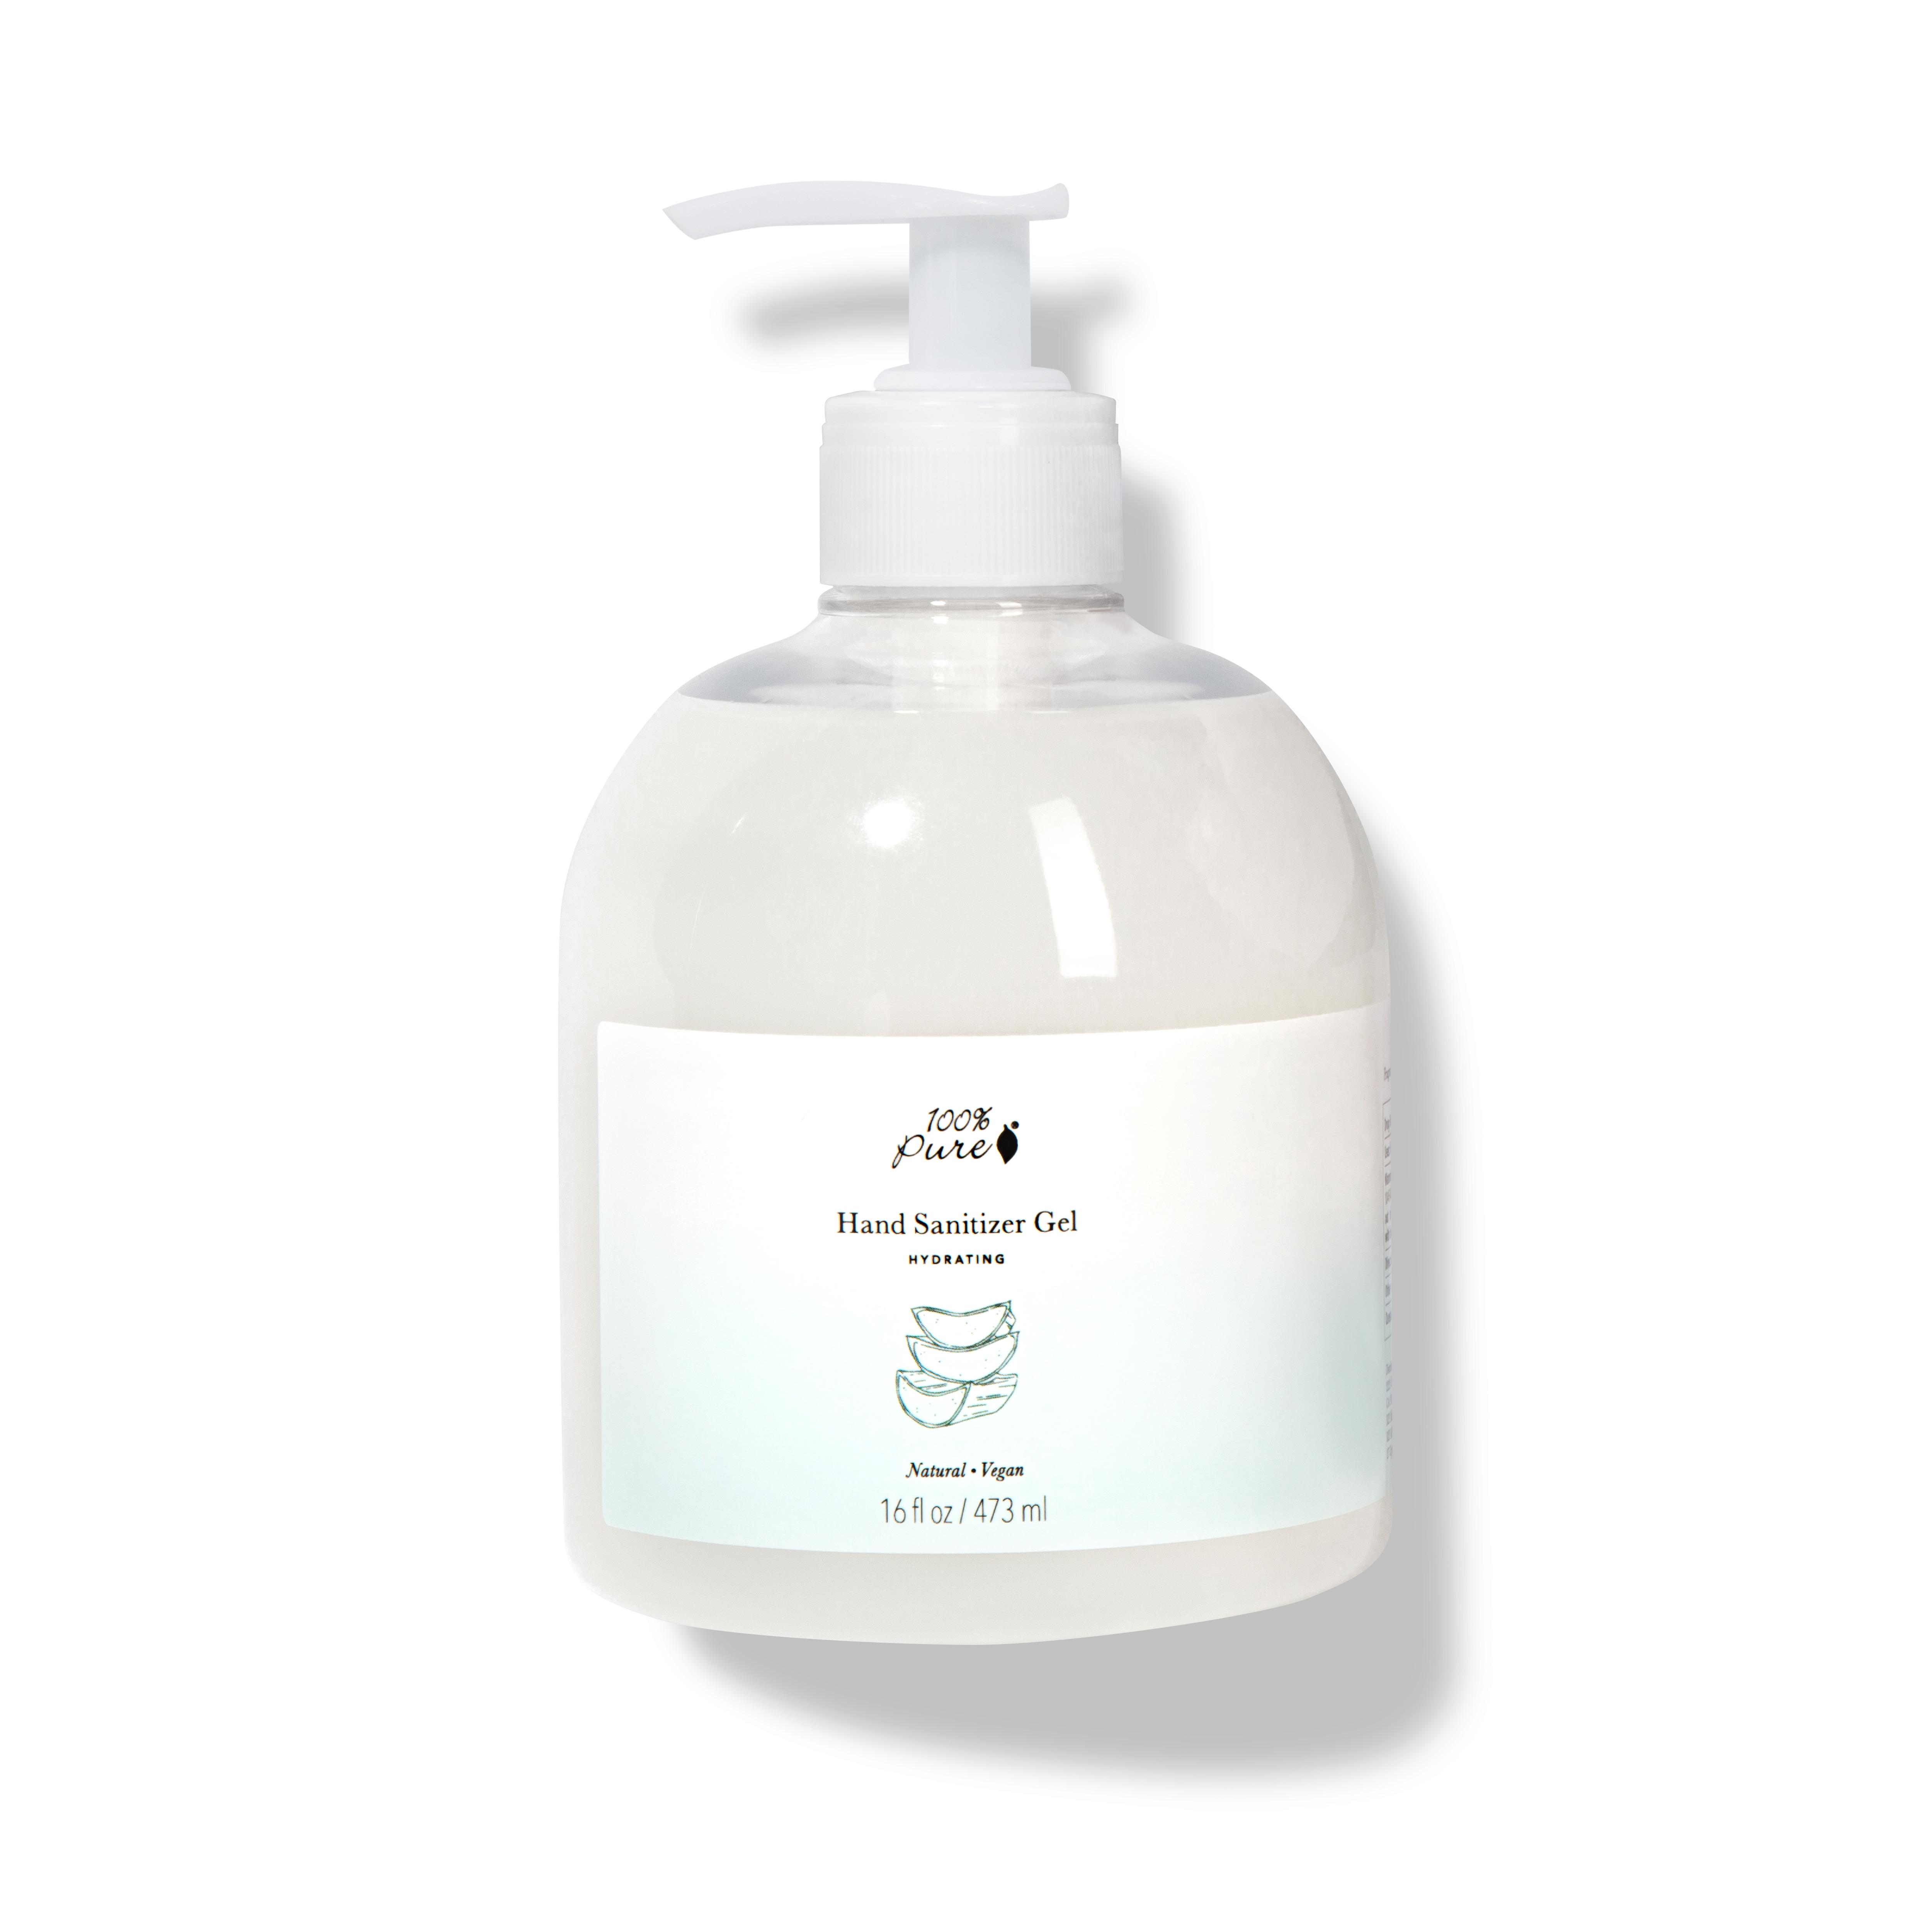 Product Grid - Hand Sanitizer Gel